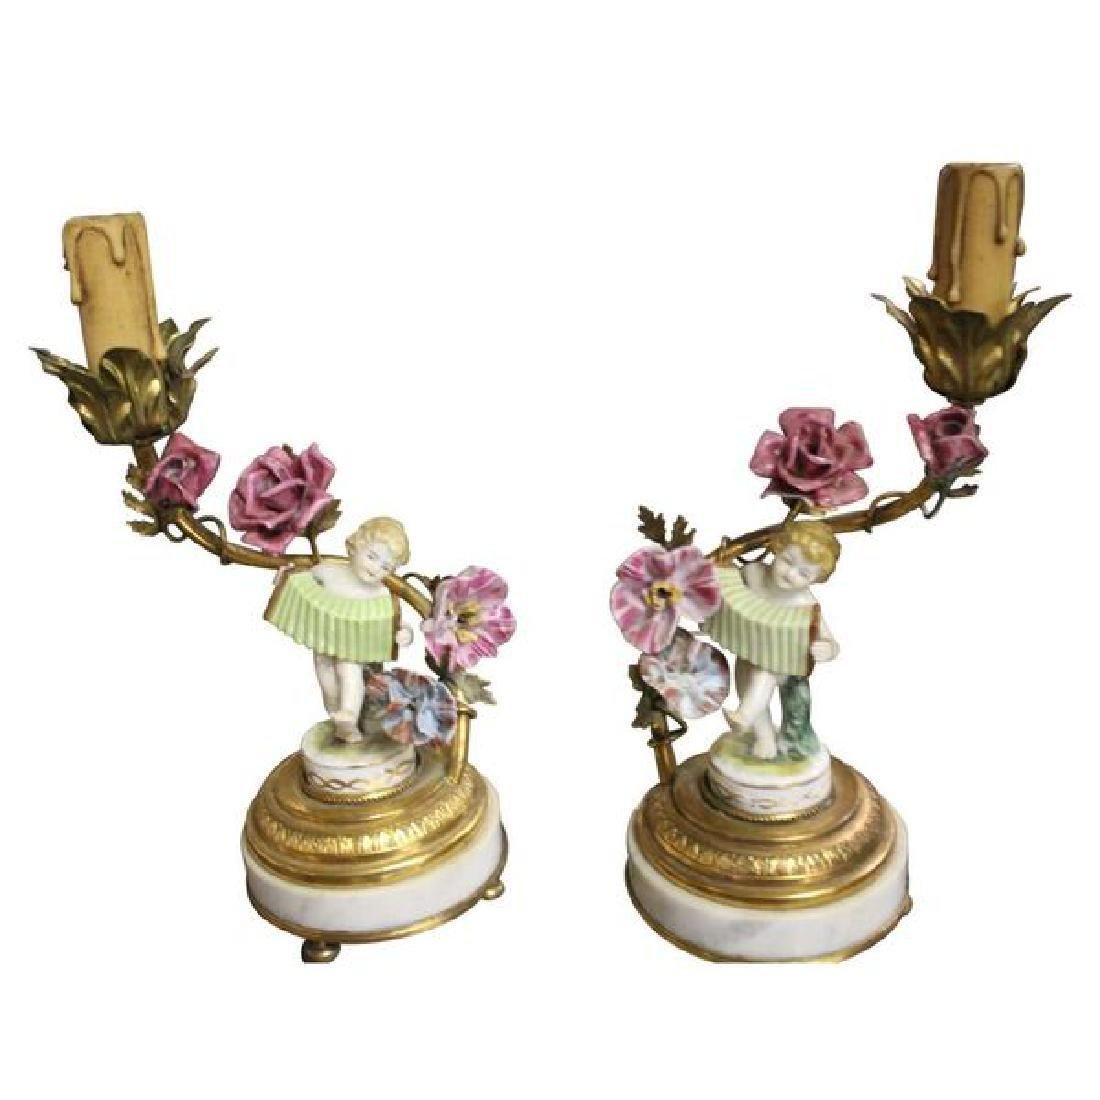 Pair of Porcelain Boudoir Cherub Lamps